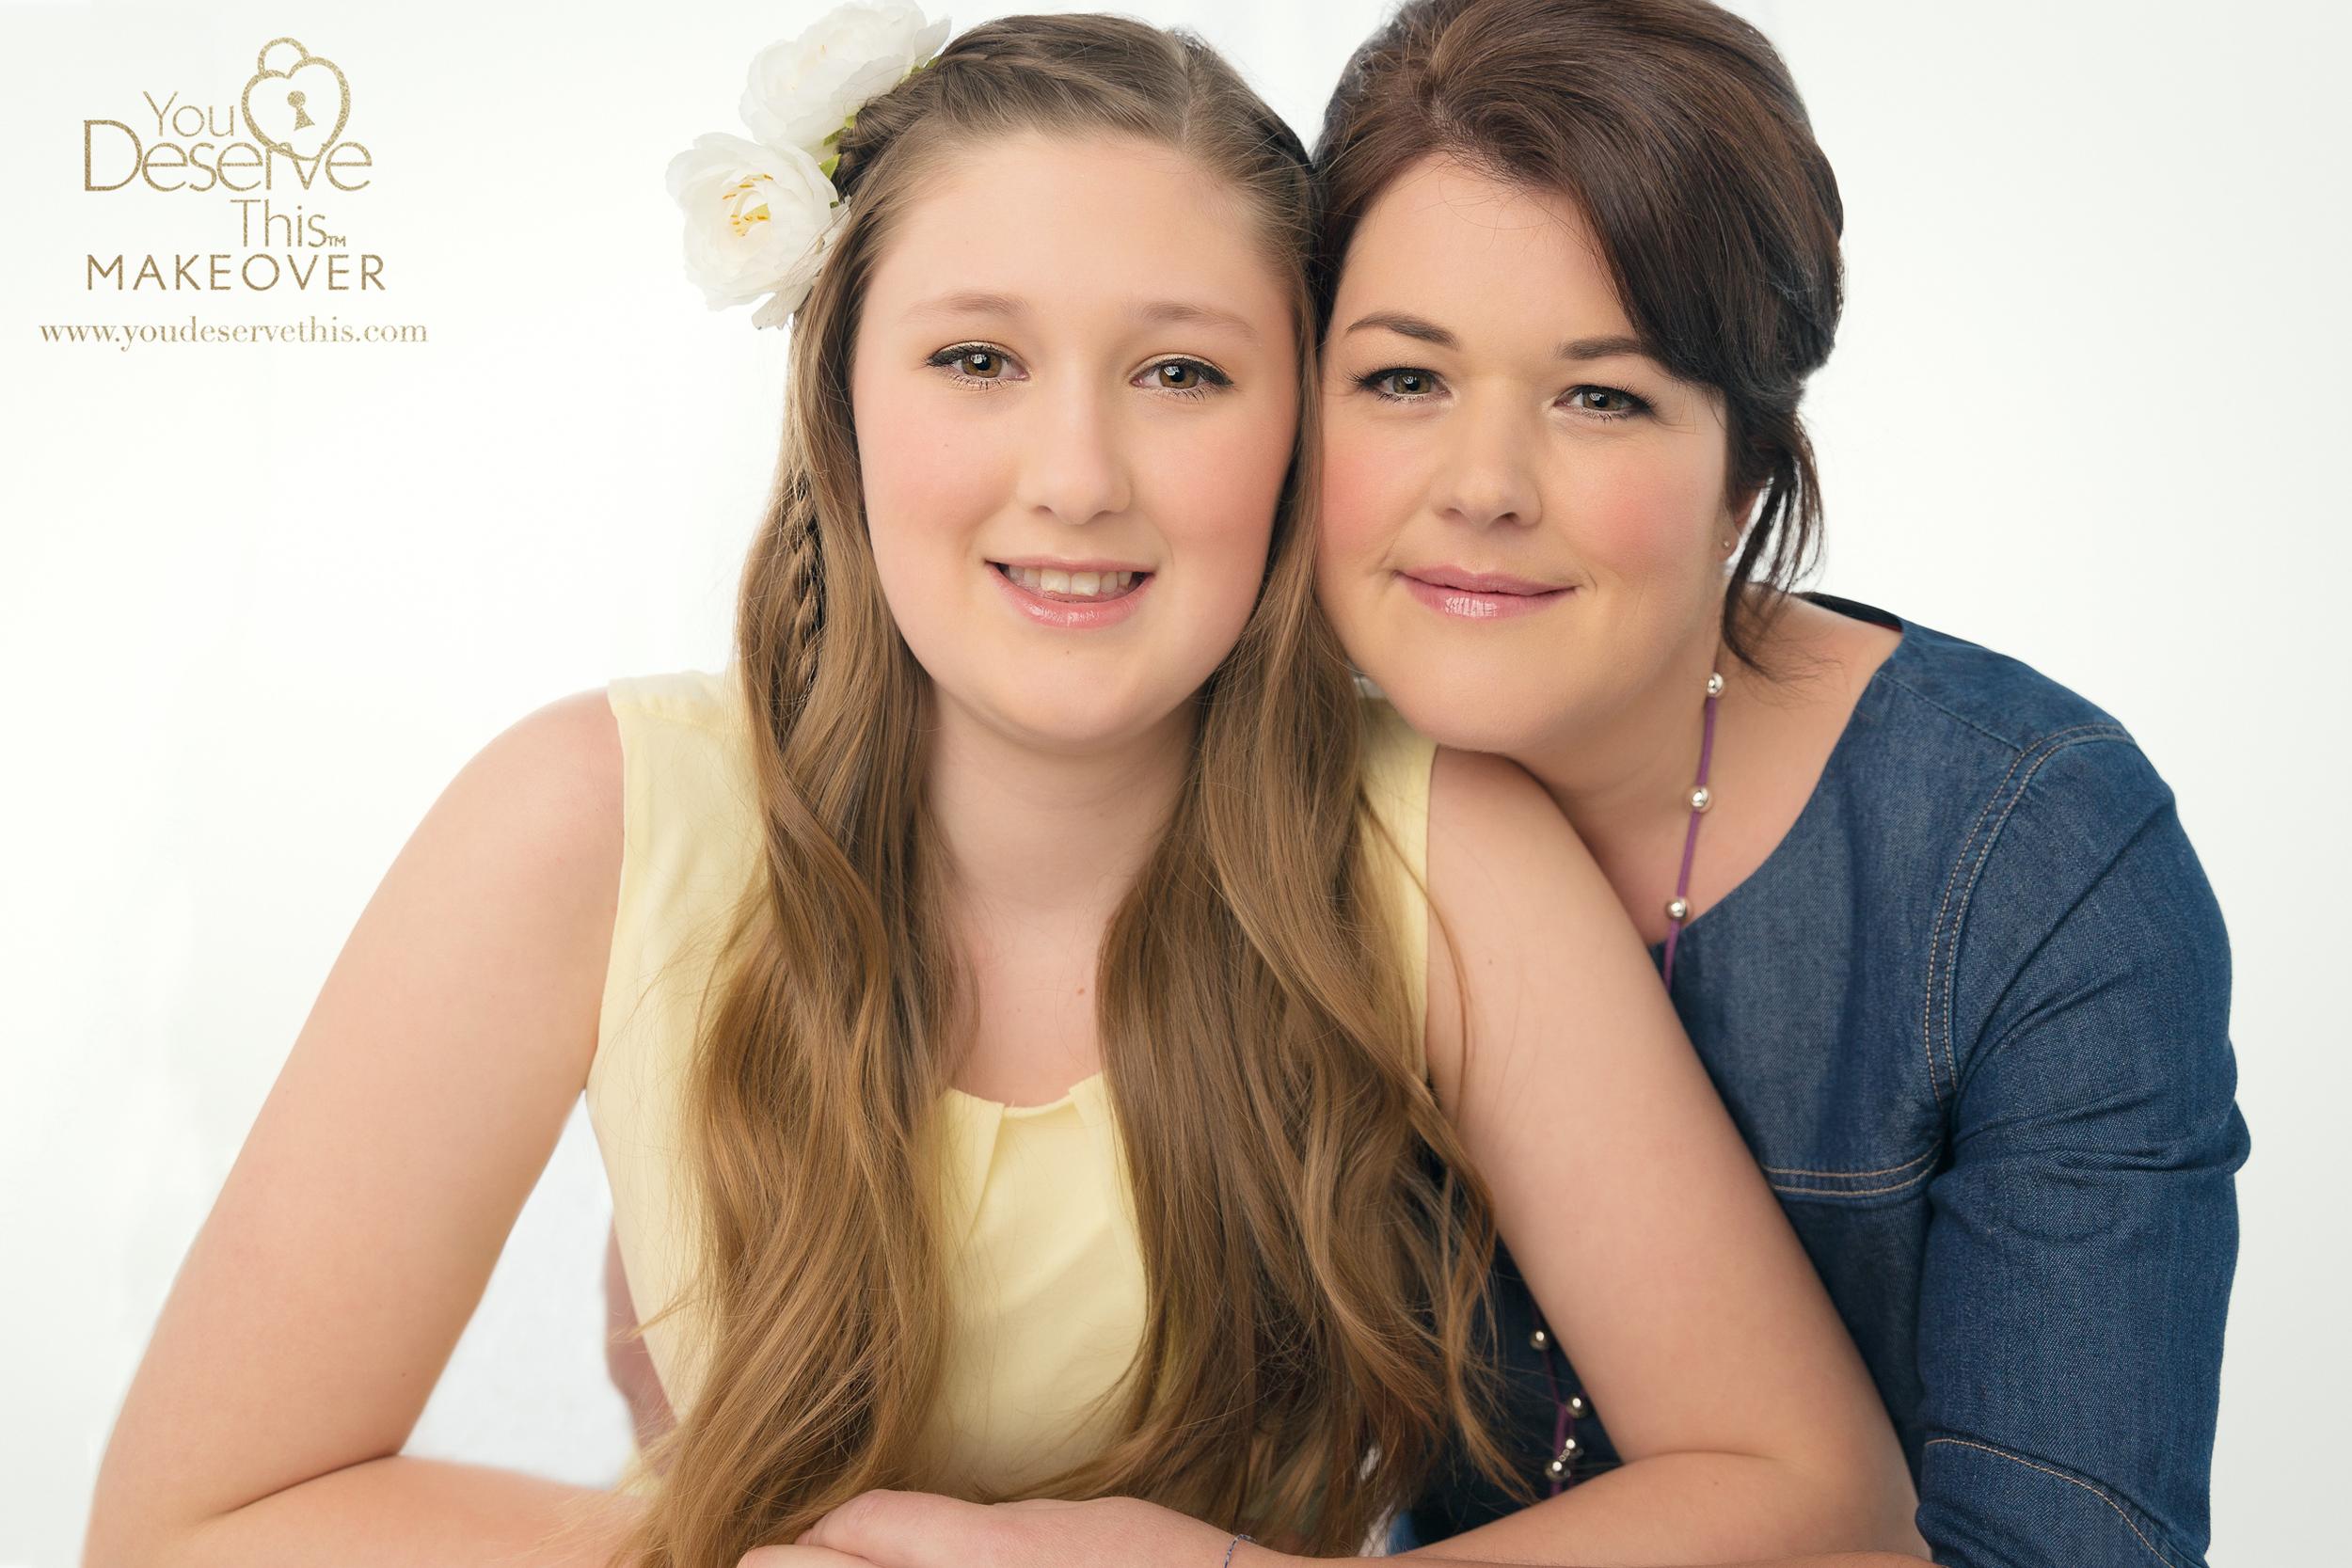 Mum and Daughter Portraits UK  www.youdeservethis.com